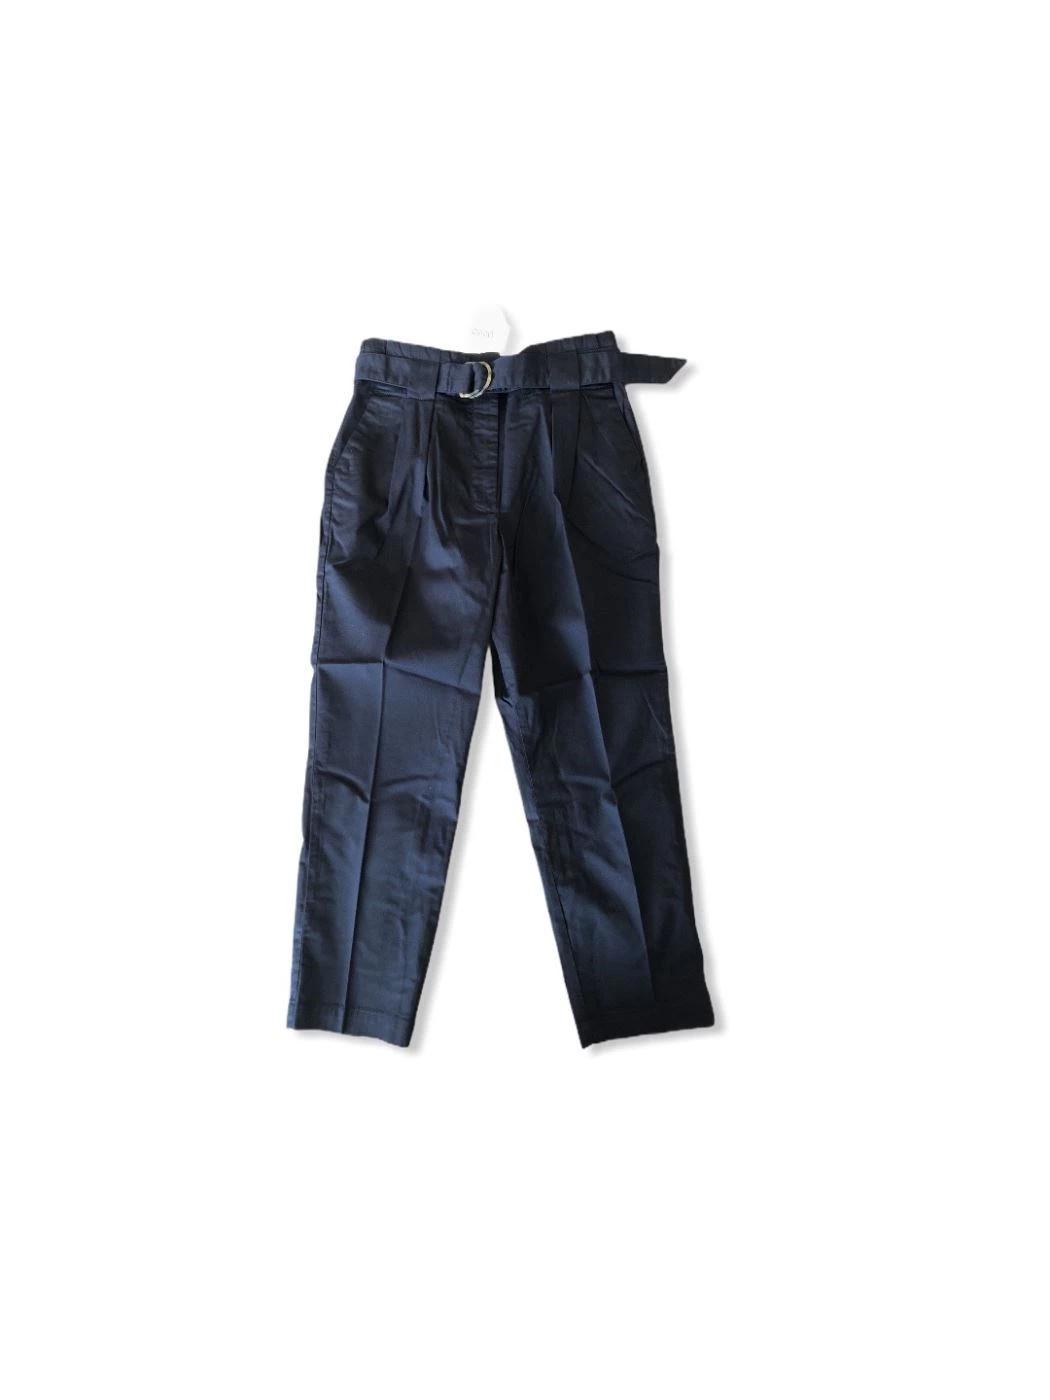 LIU JO pantalone savana FA0311T4140-1